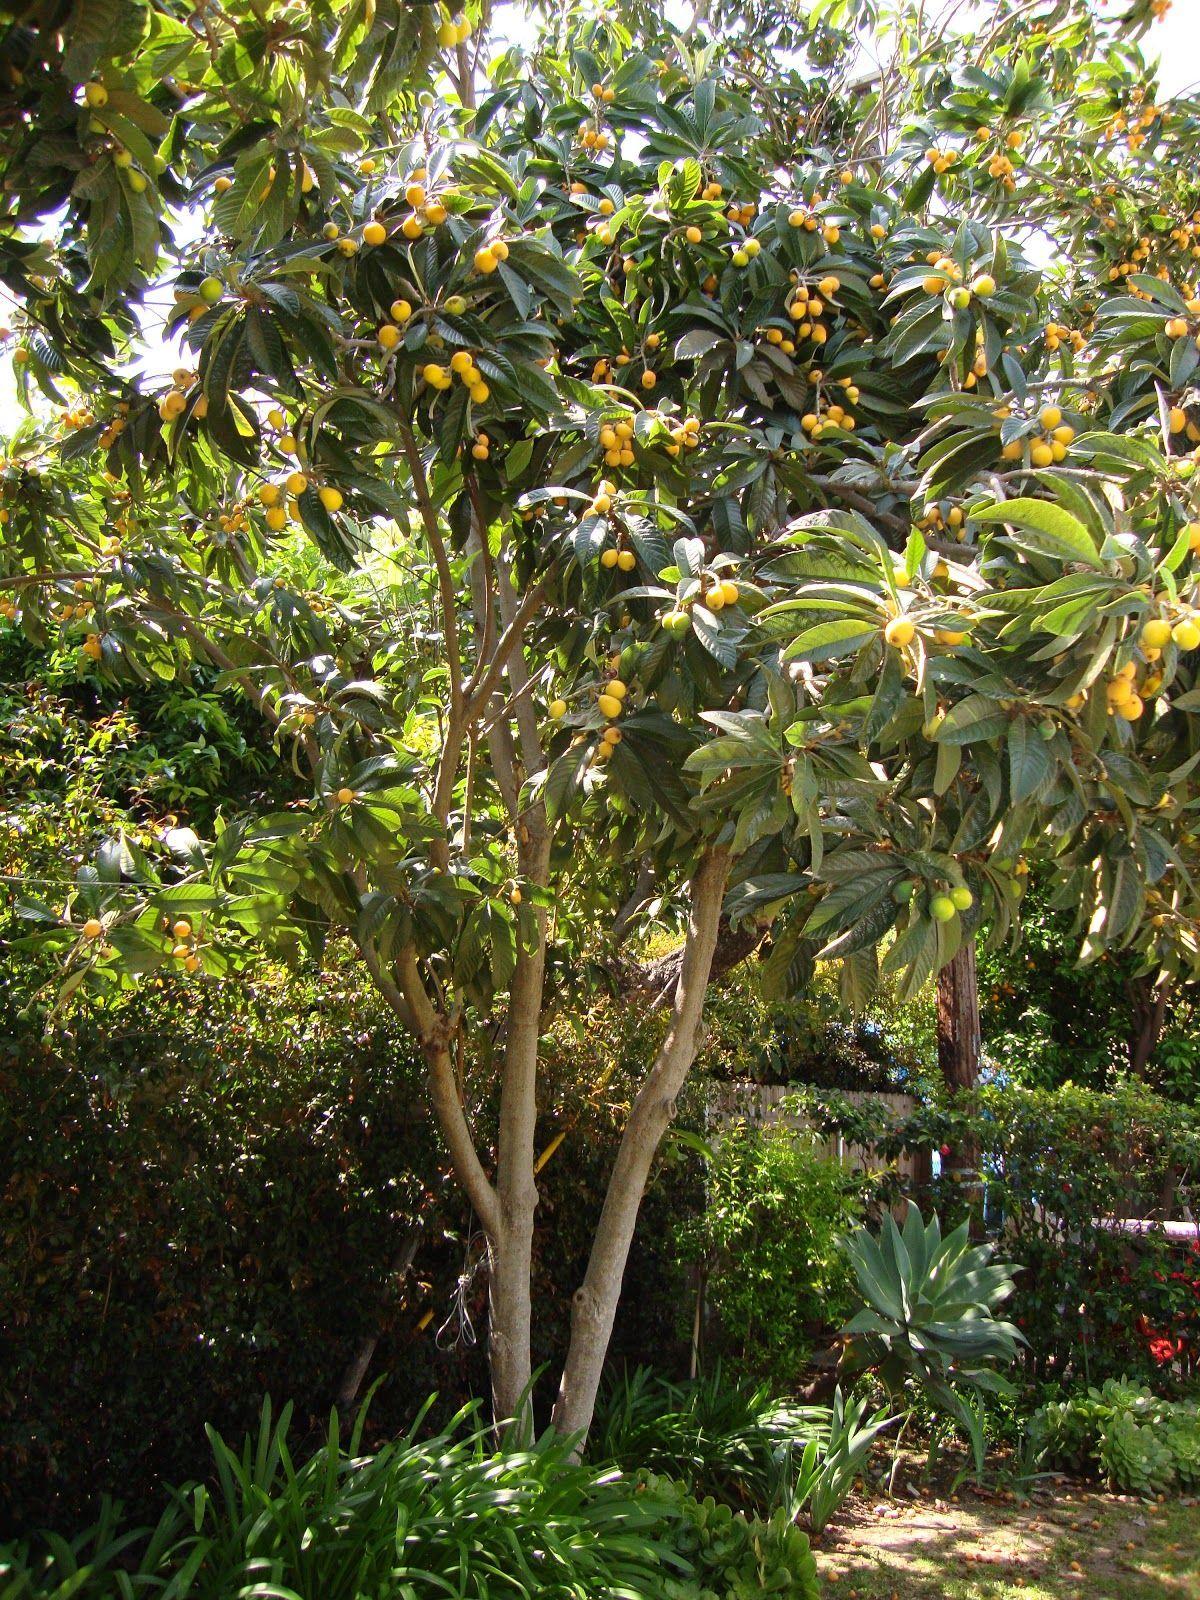 Backyard Garden With Fruit Loquat Tree | gardening | Pinterest ...